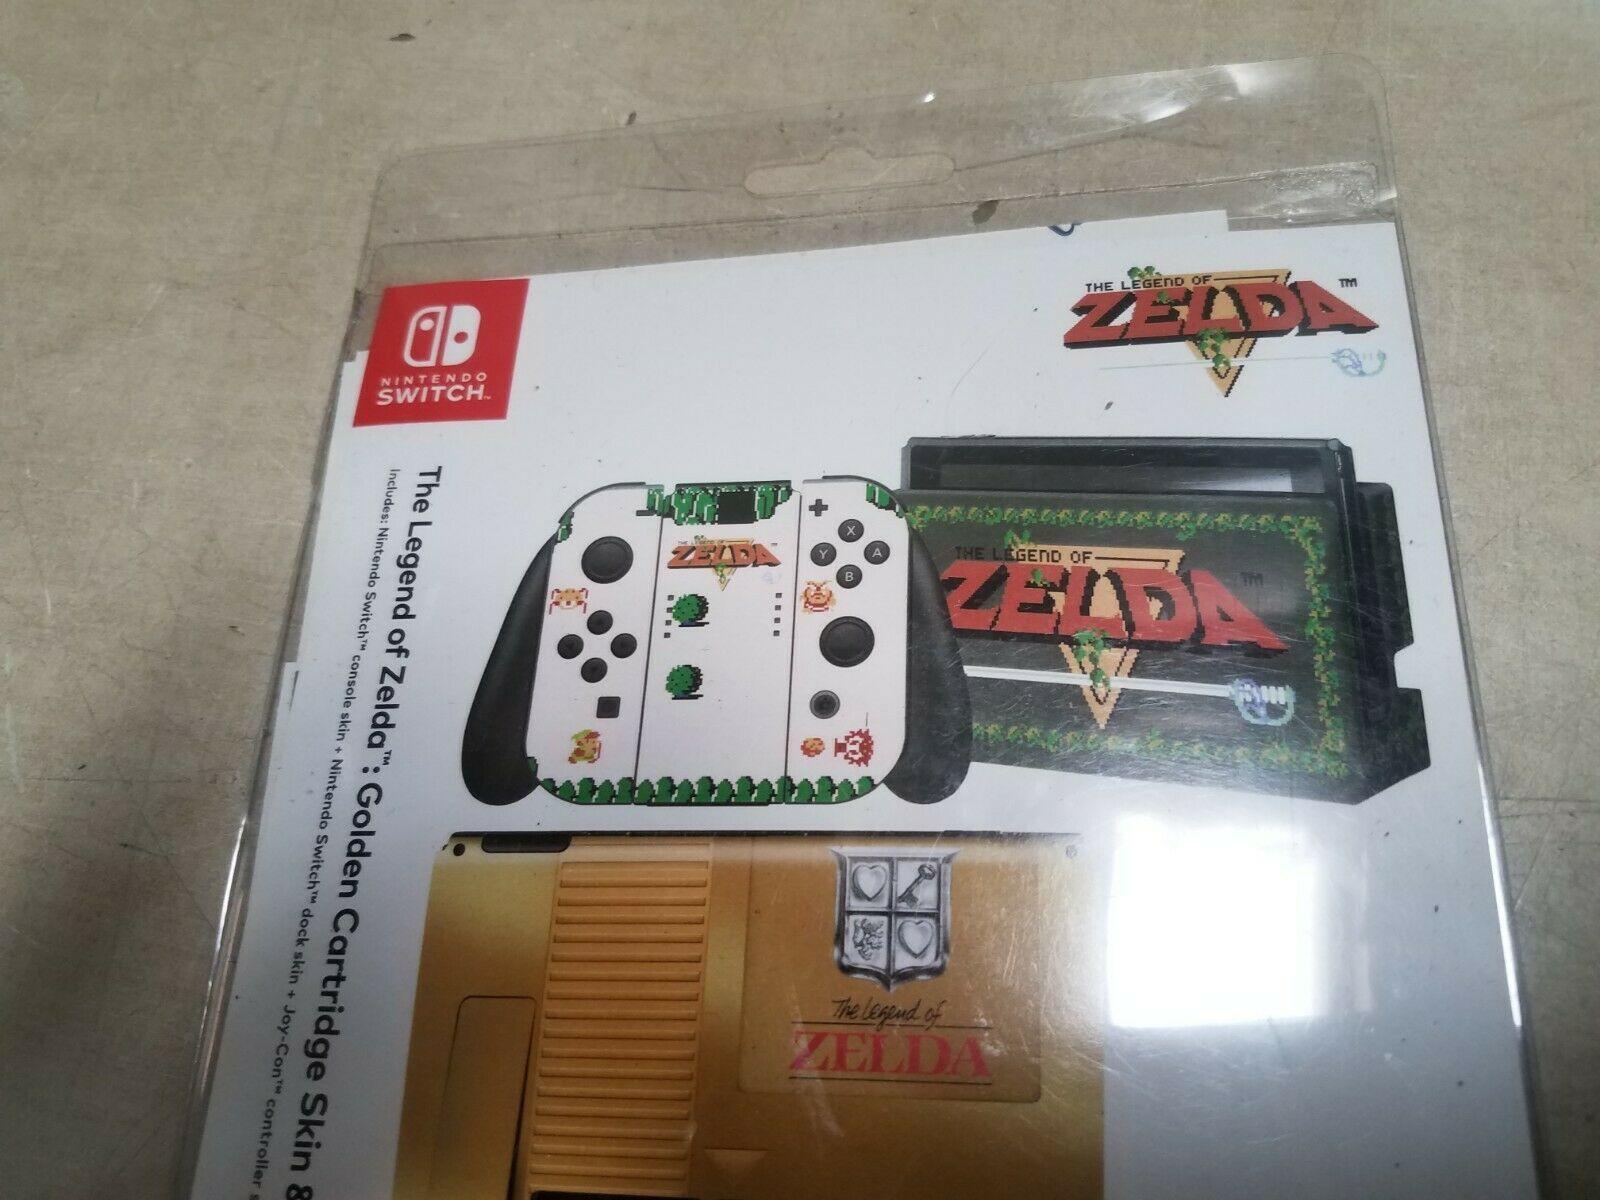 Nintendo Switch The Legend of Zelda Skin and Protector Set